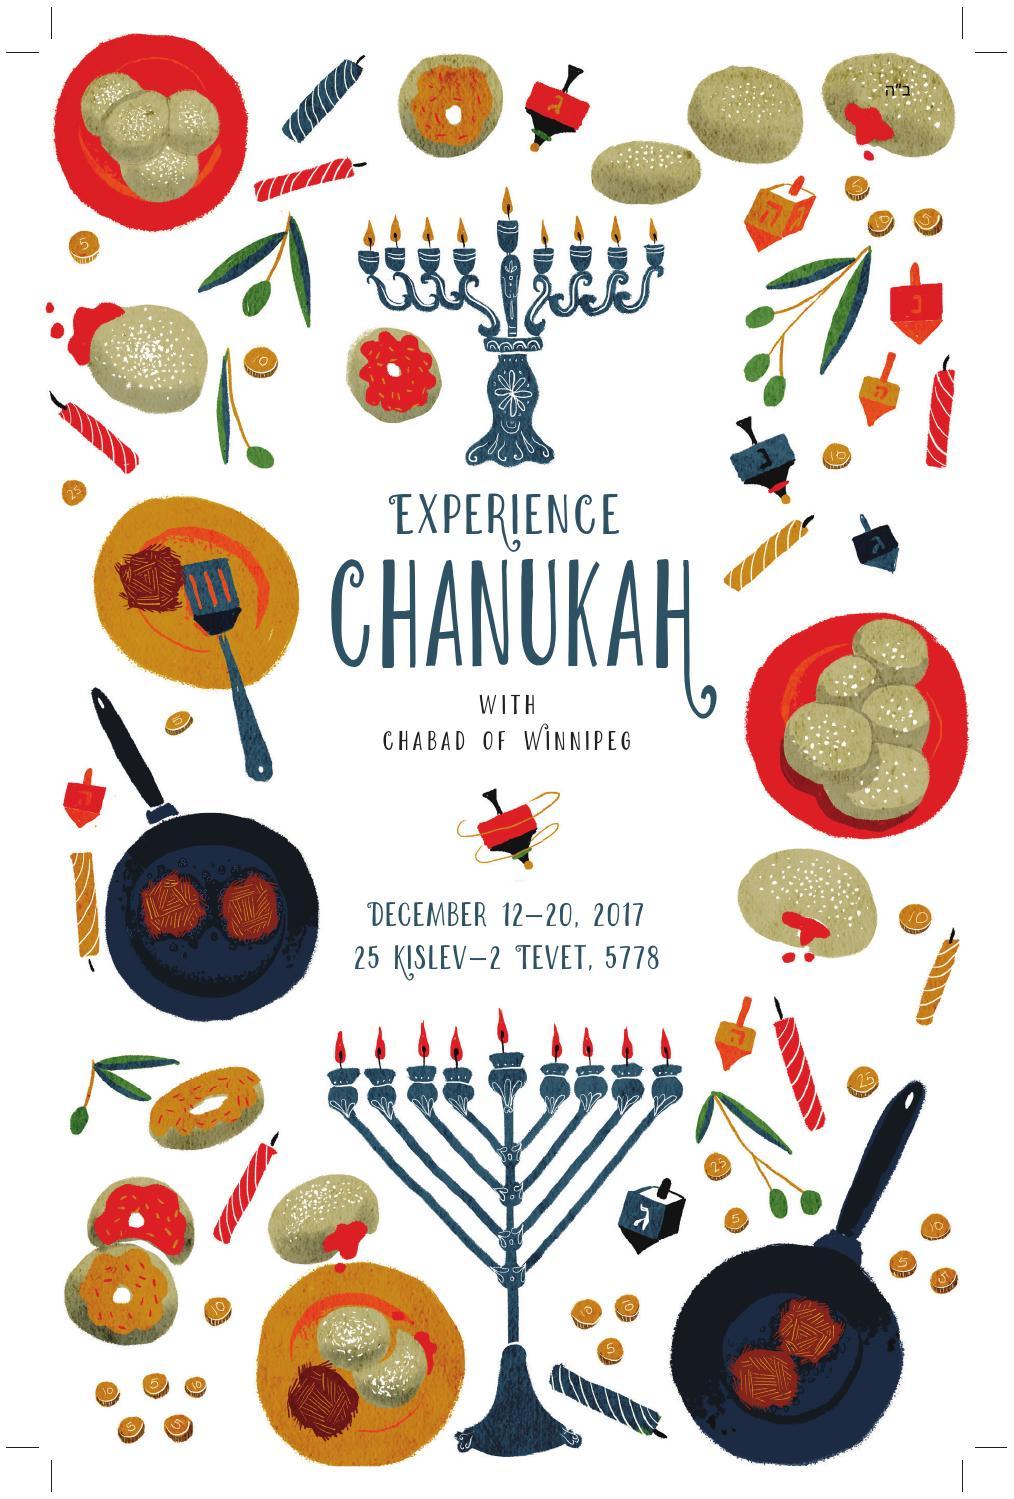 Chanukah Guide 2017 By Chabad Lubavitch Of Winnipeg Issuu